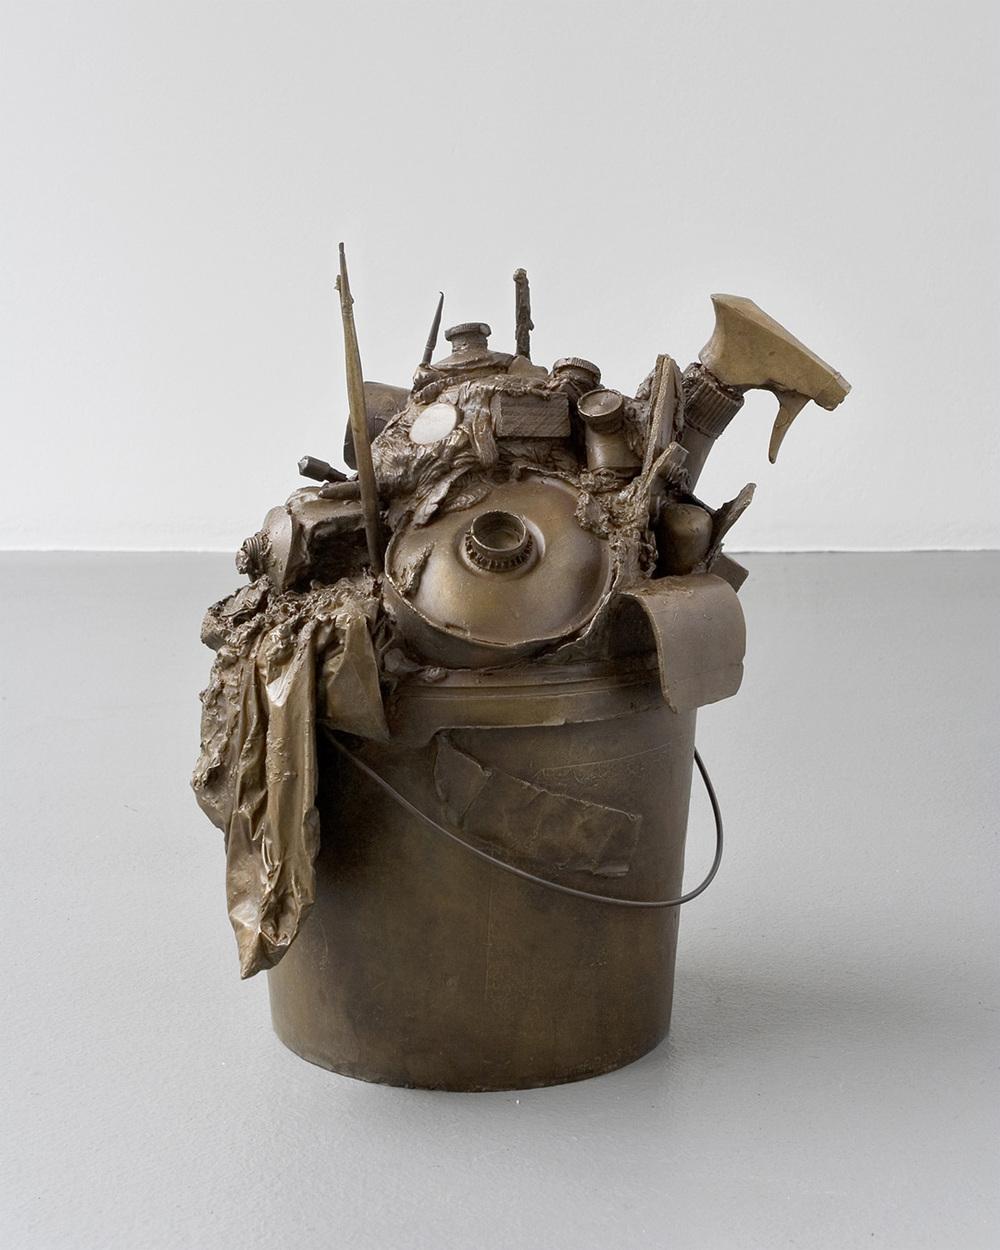 Ulrich Lamsfuss   ohne Titel (Spaltprodukt 3) , 2008 Bronze, oval bucket, artist's tools 14.37 x 12.6 x 10.04 inches (approx.) 36.5 x 32 x 25.5 cm